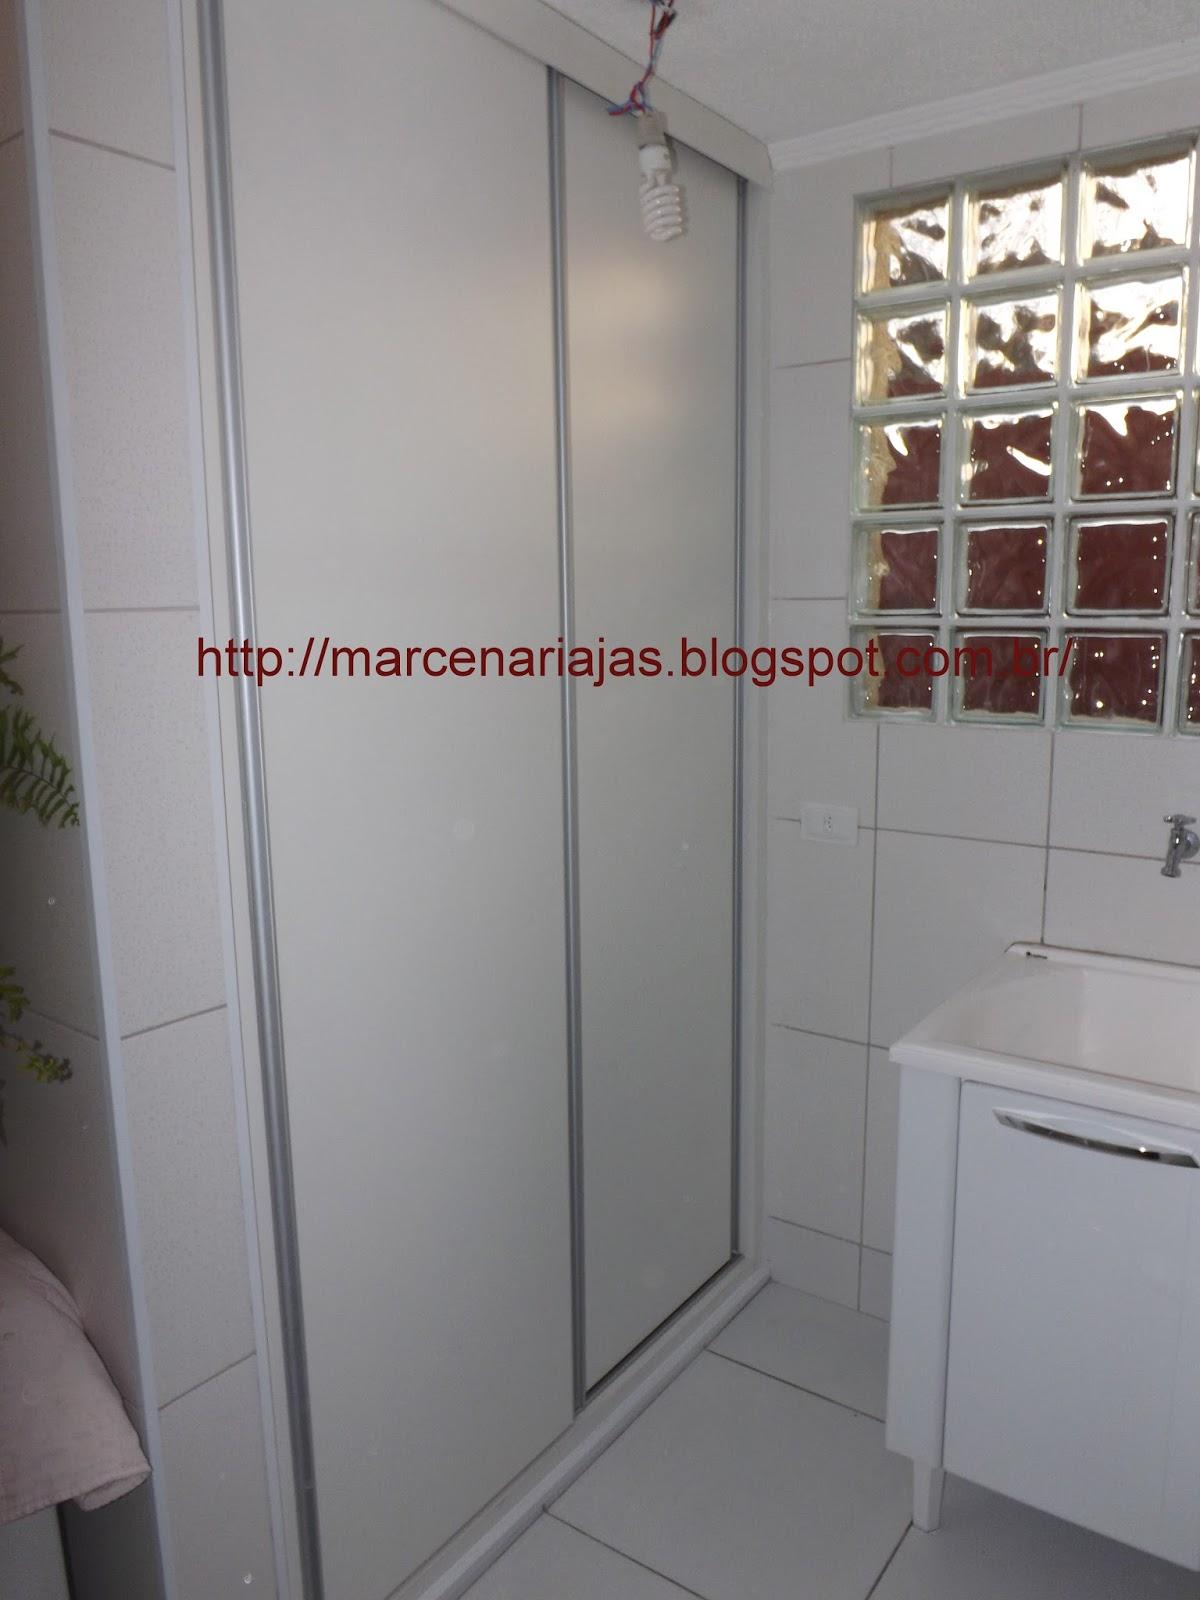 Armario De Lavanderia Com Porta De Correr : Marcenaria j a s armario de lavenderia e porta para